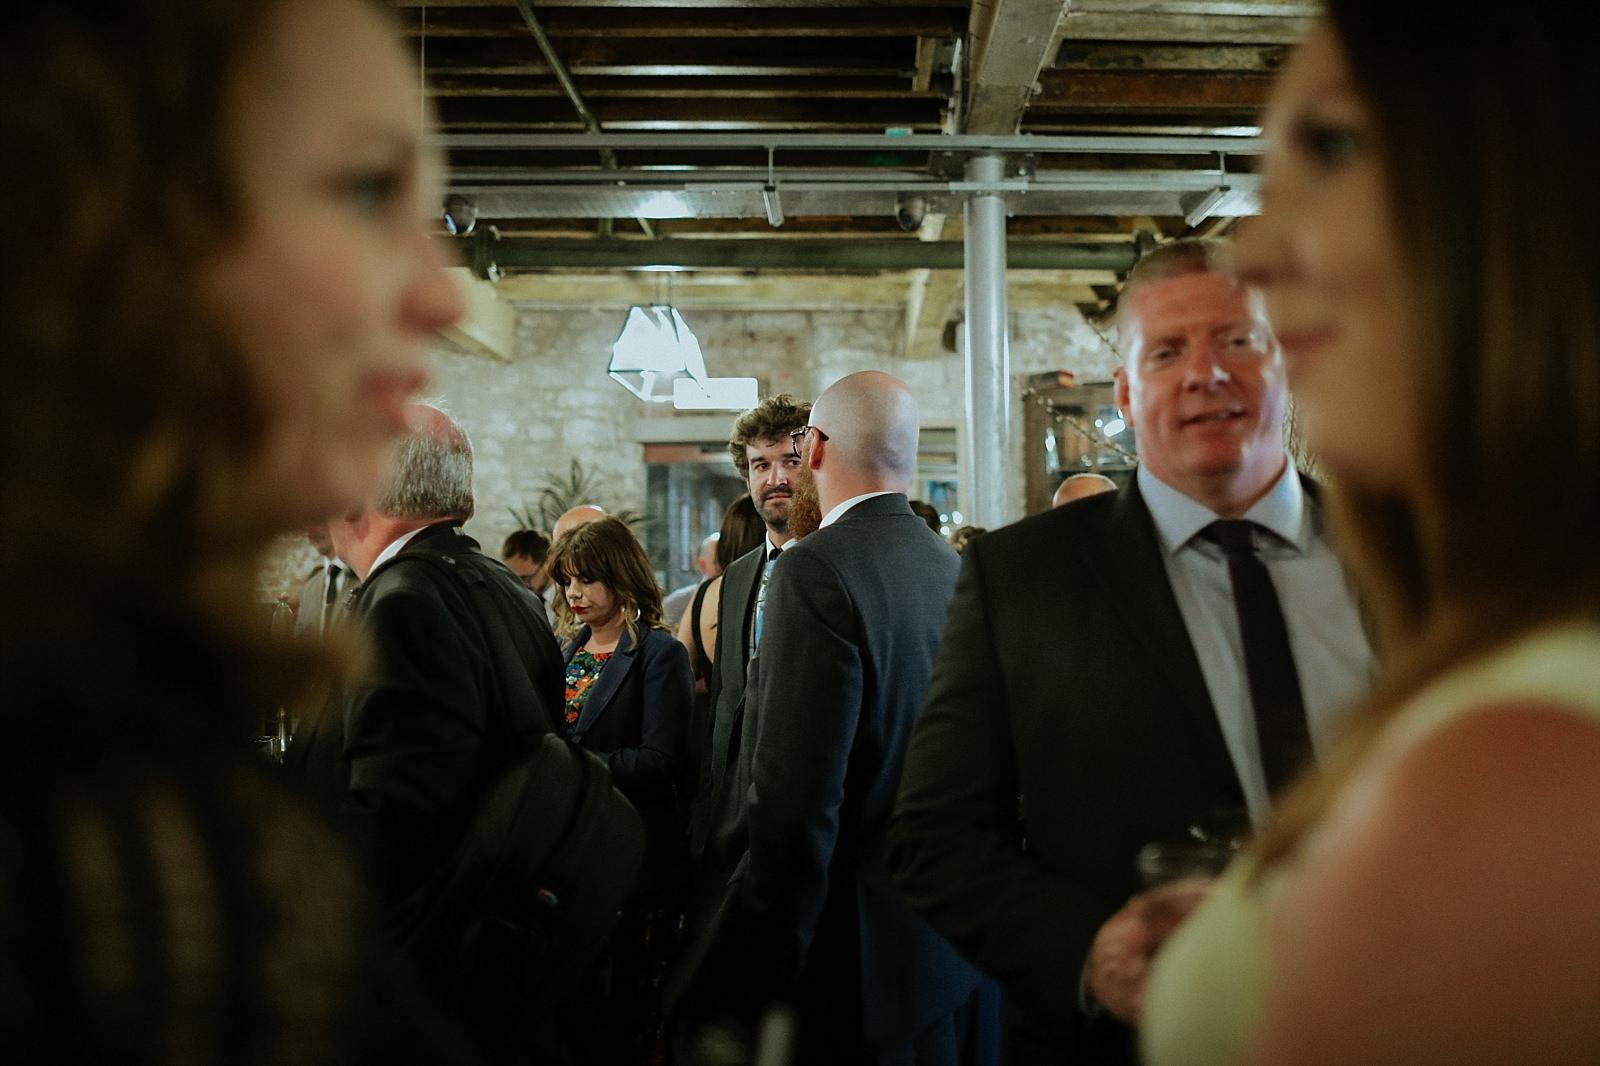 gathering guests at a wedding